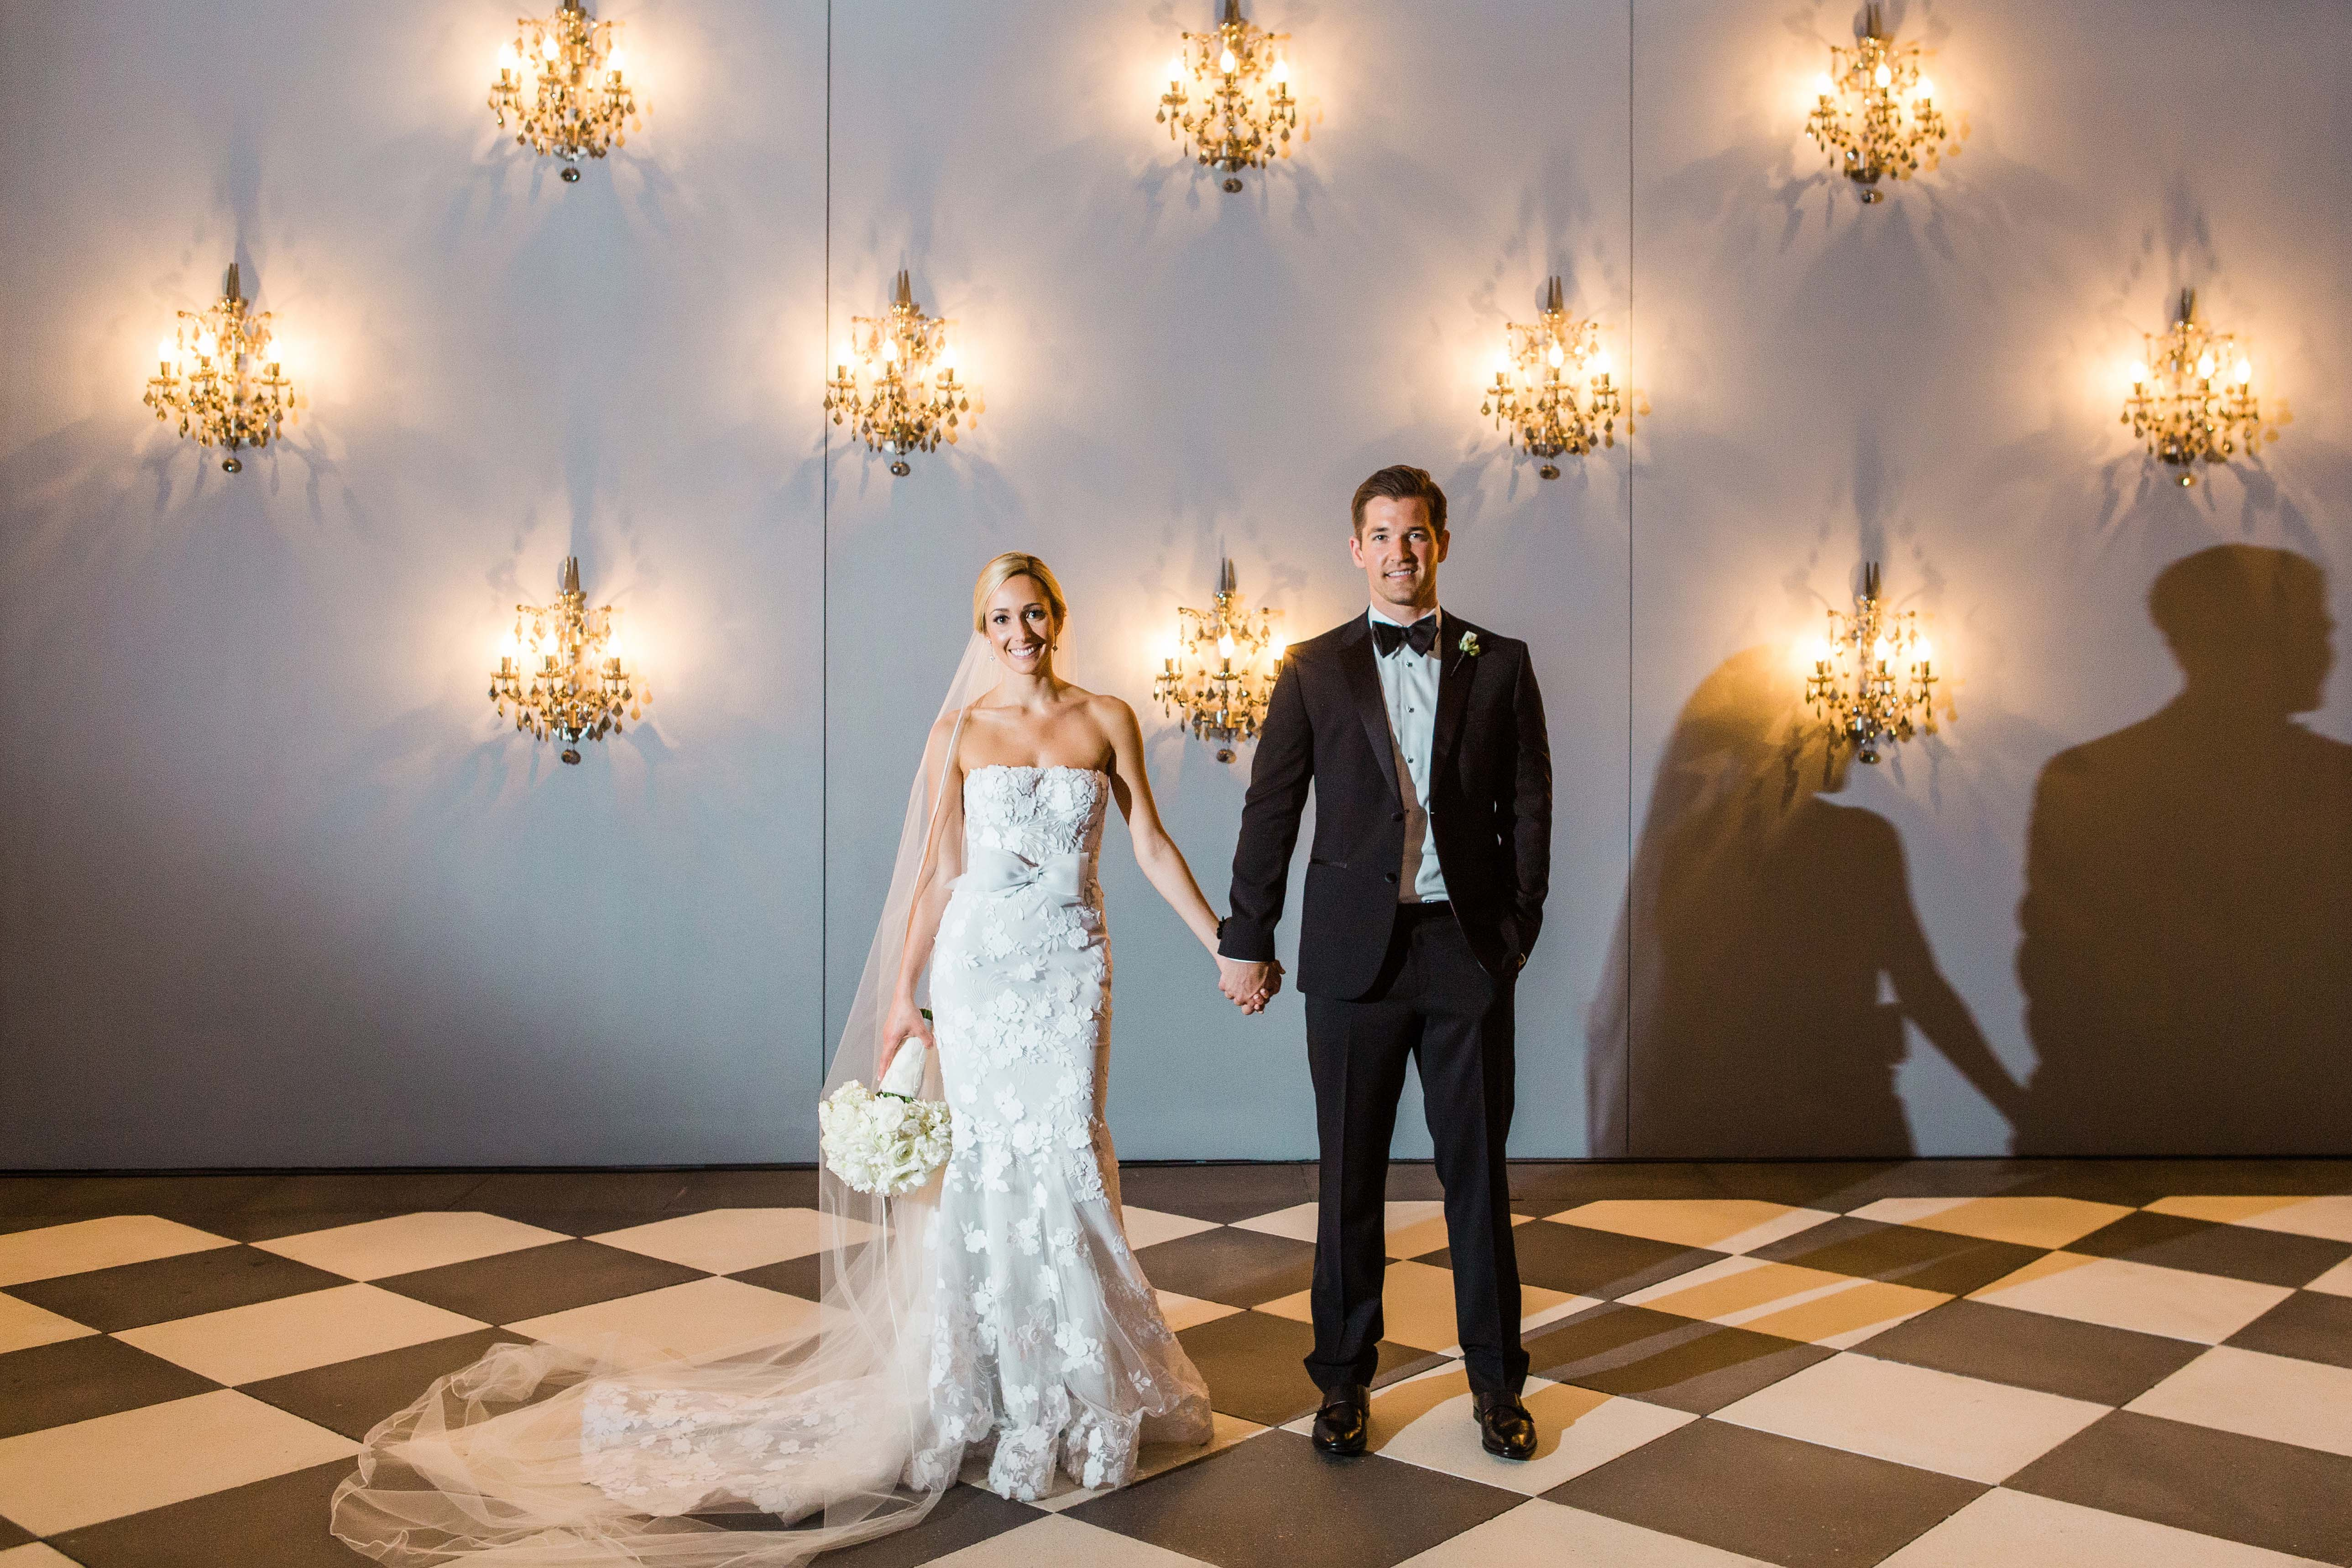 wedding chandelier permanent wall mount lighting